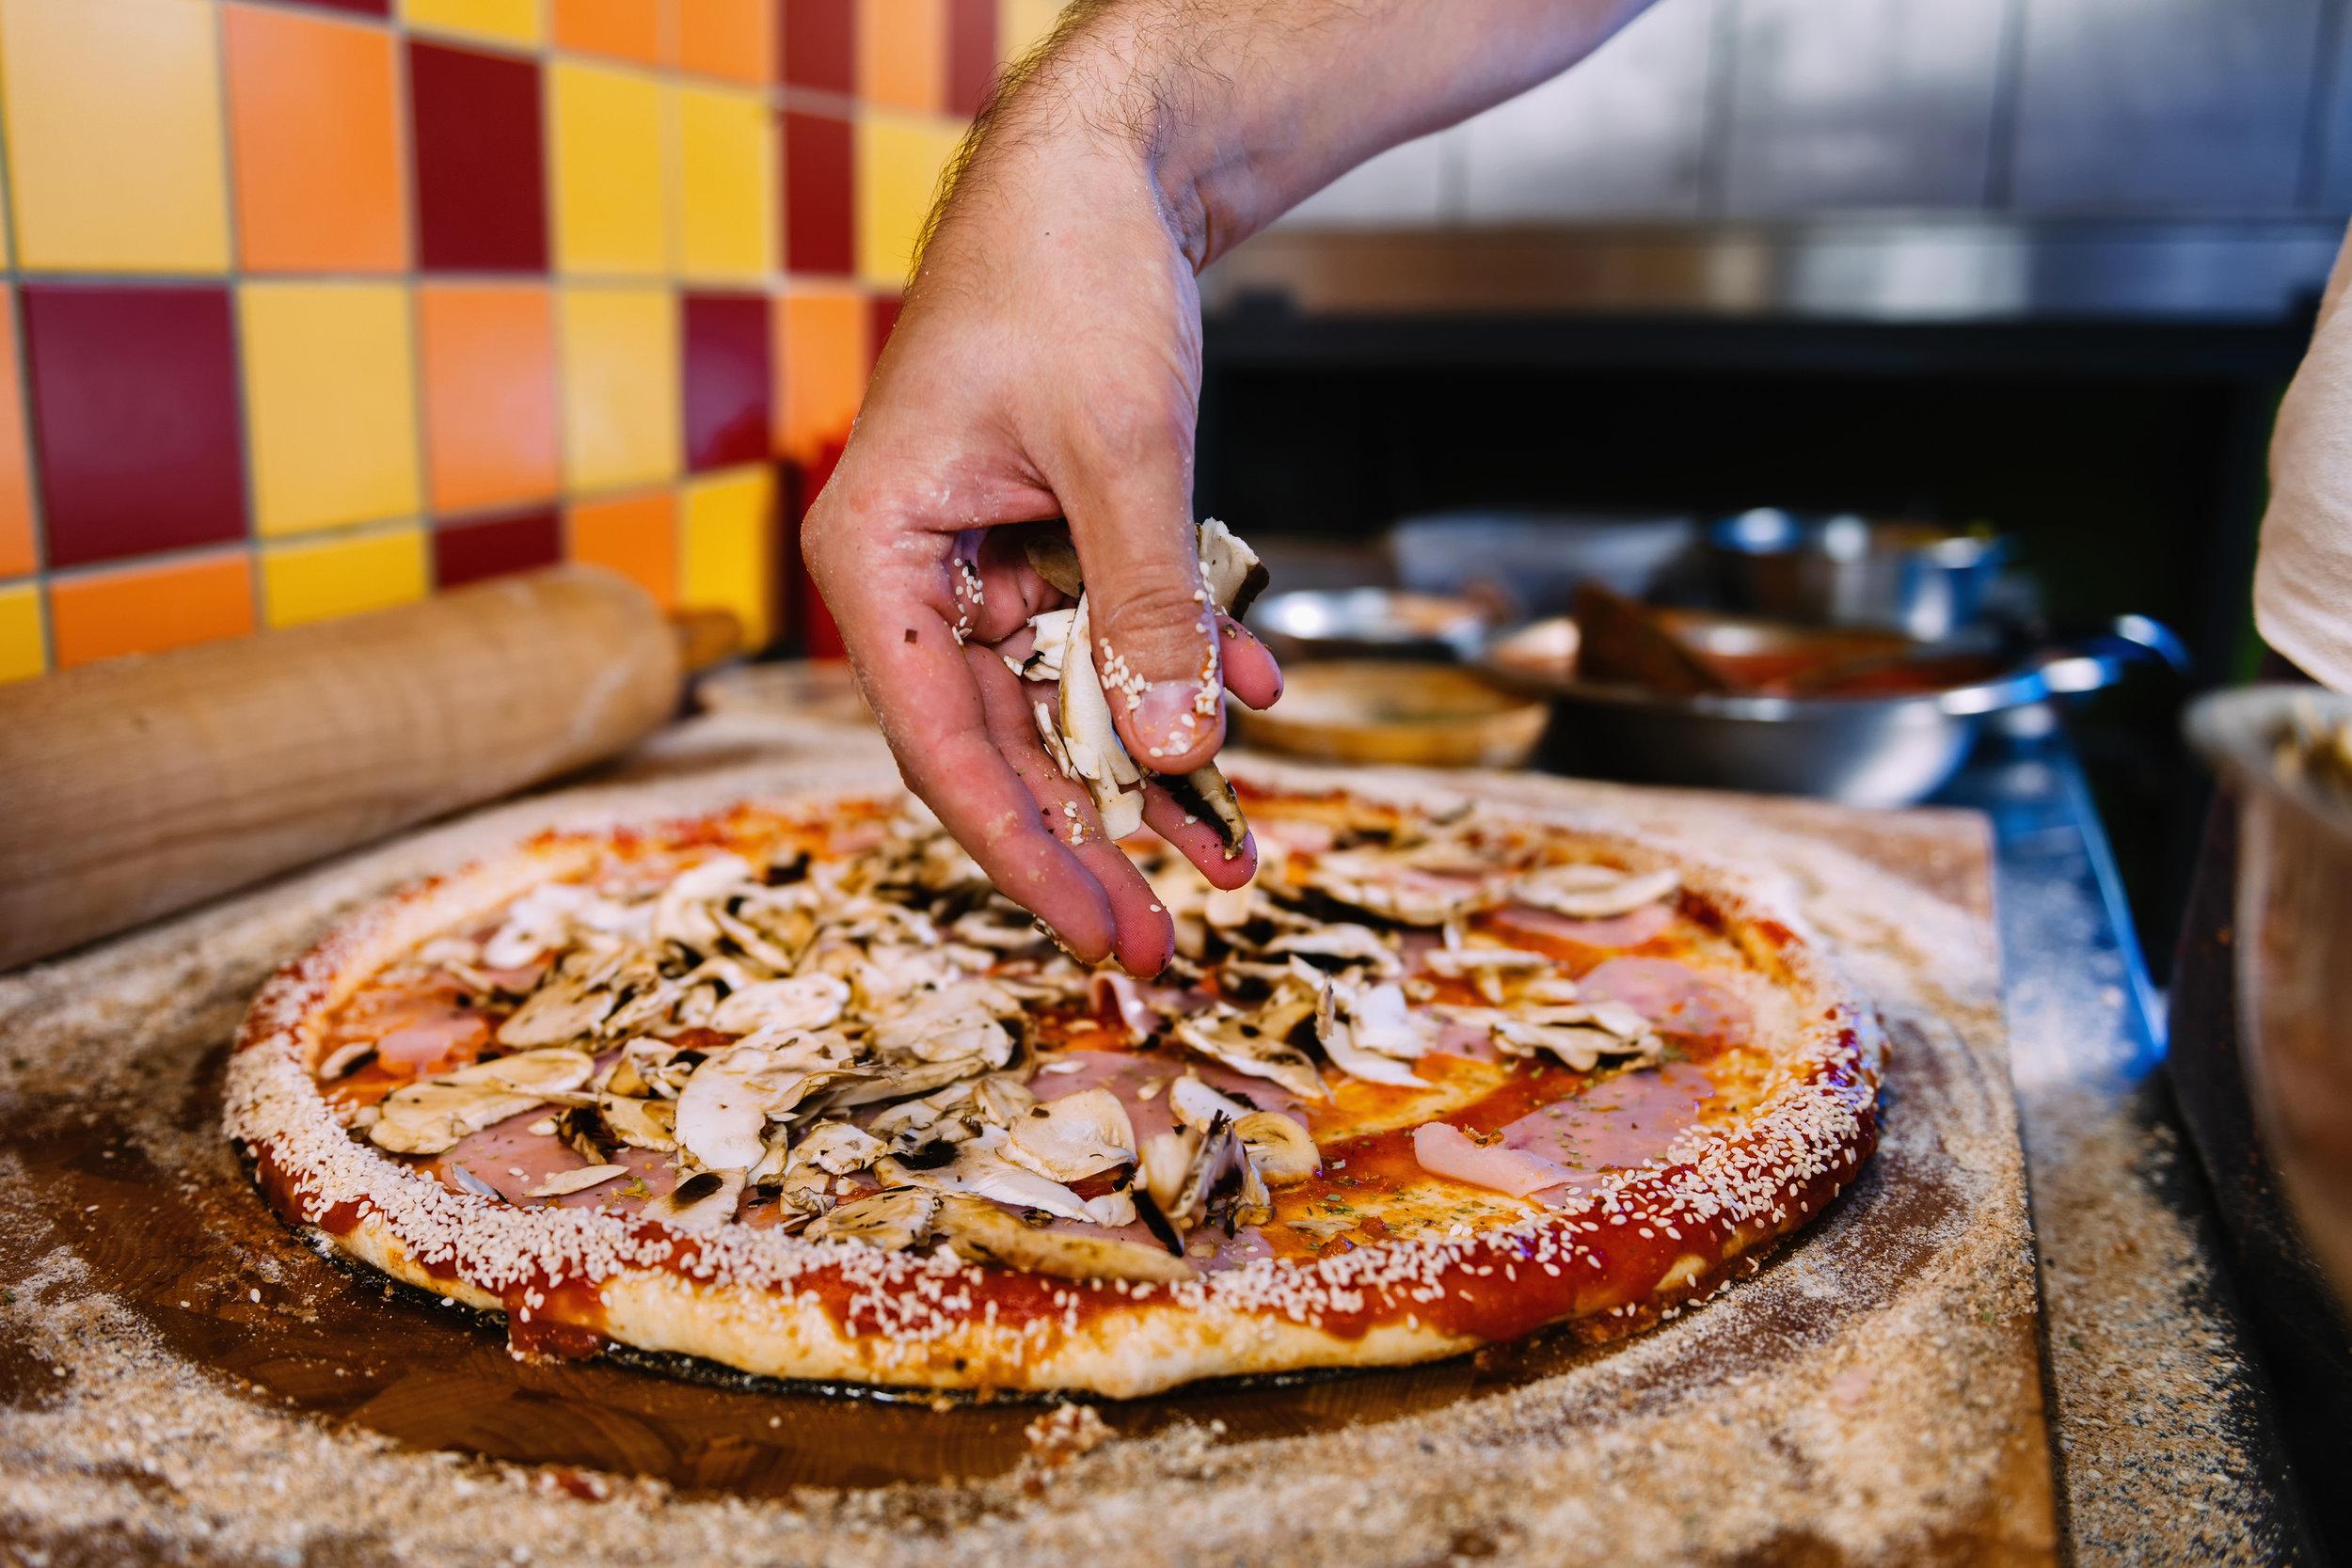 bigstock-Putting-Mushrooms-On-Pizza-In--259090804.jpg